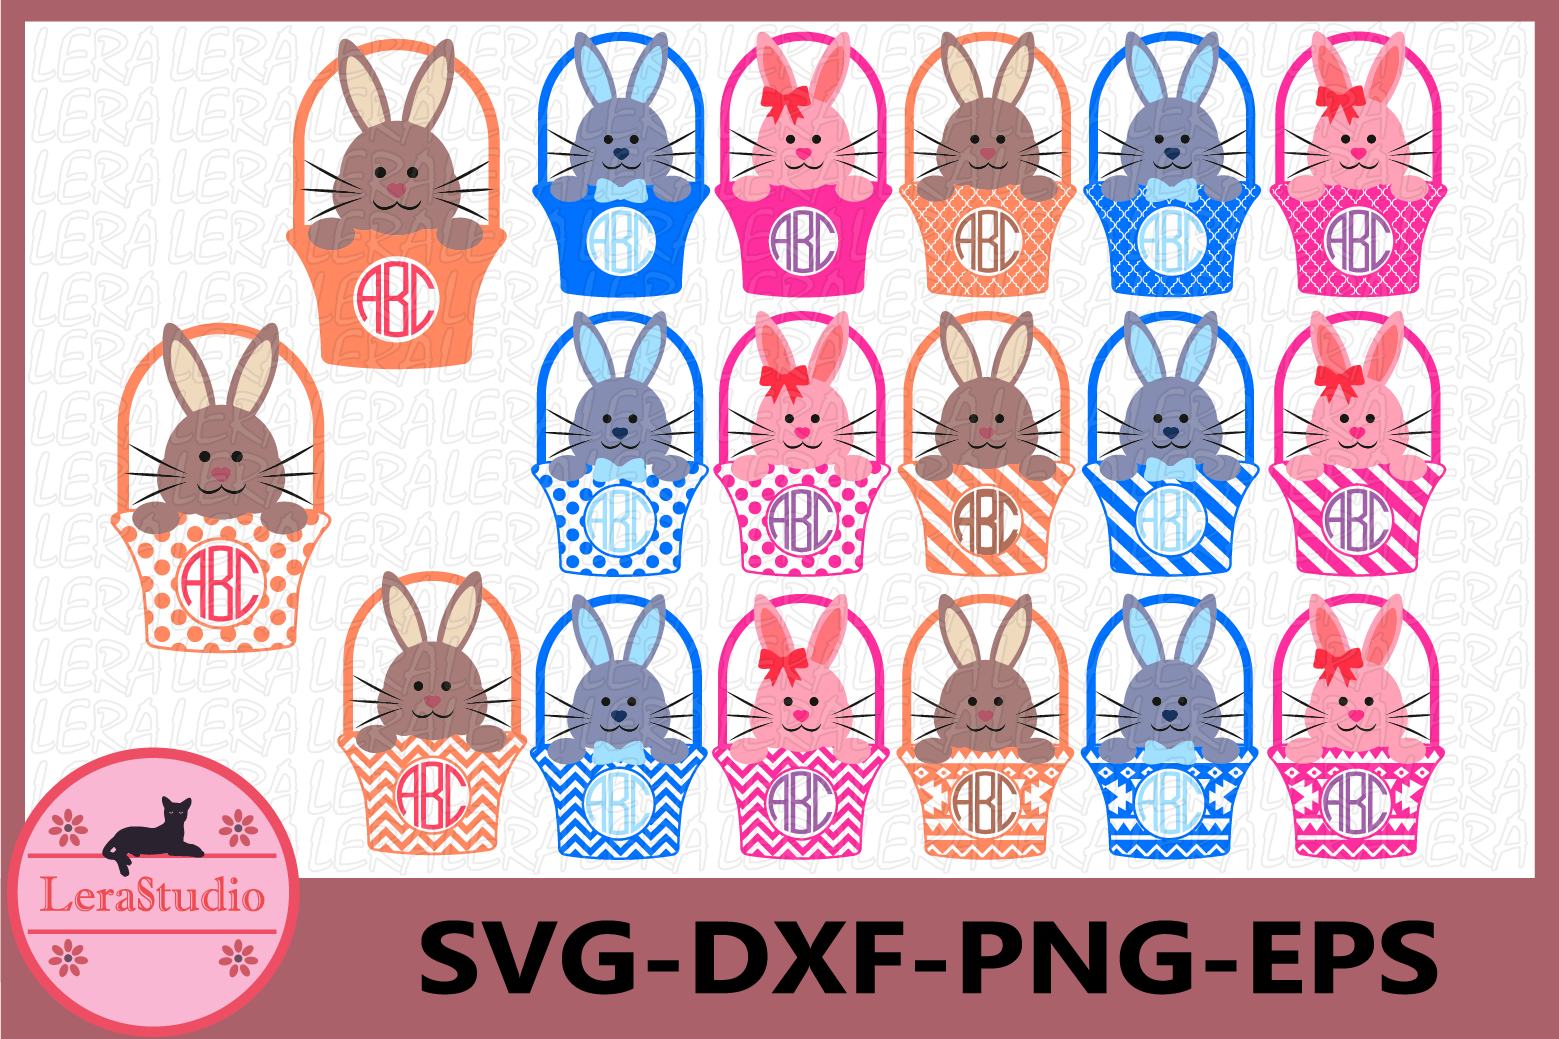 Bunny Monogram Svg, Bunny Easter Basket, Bunny Easter SVG example image 1